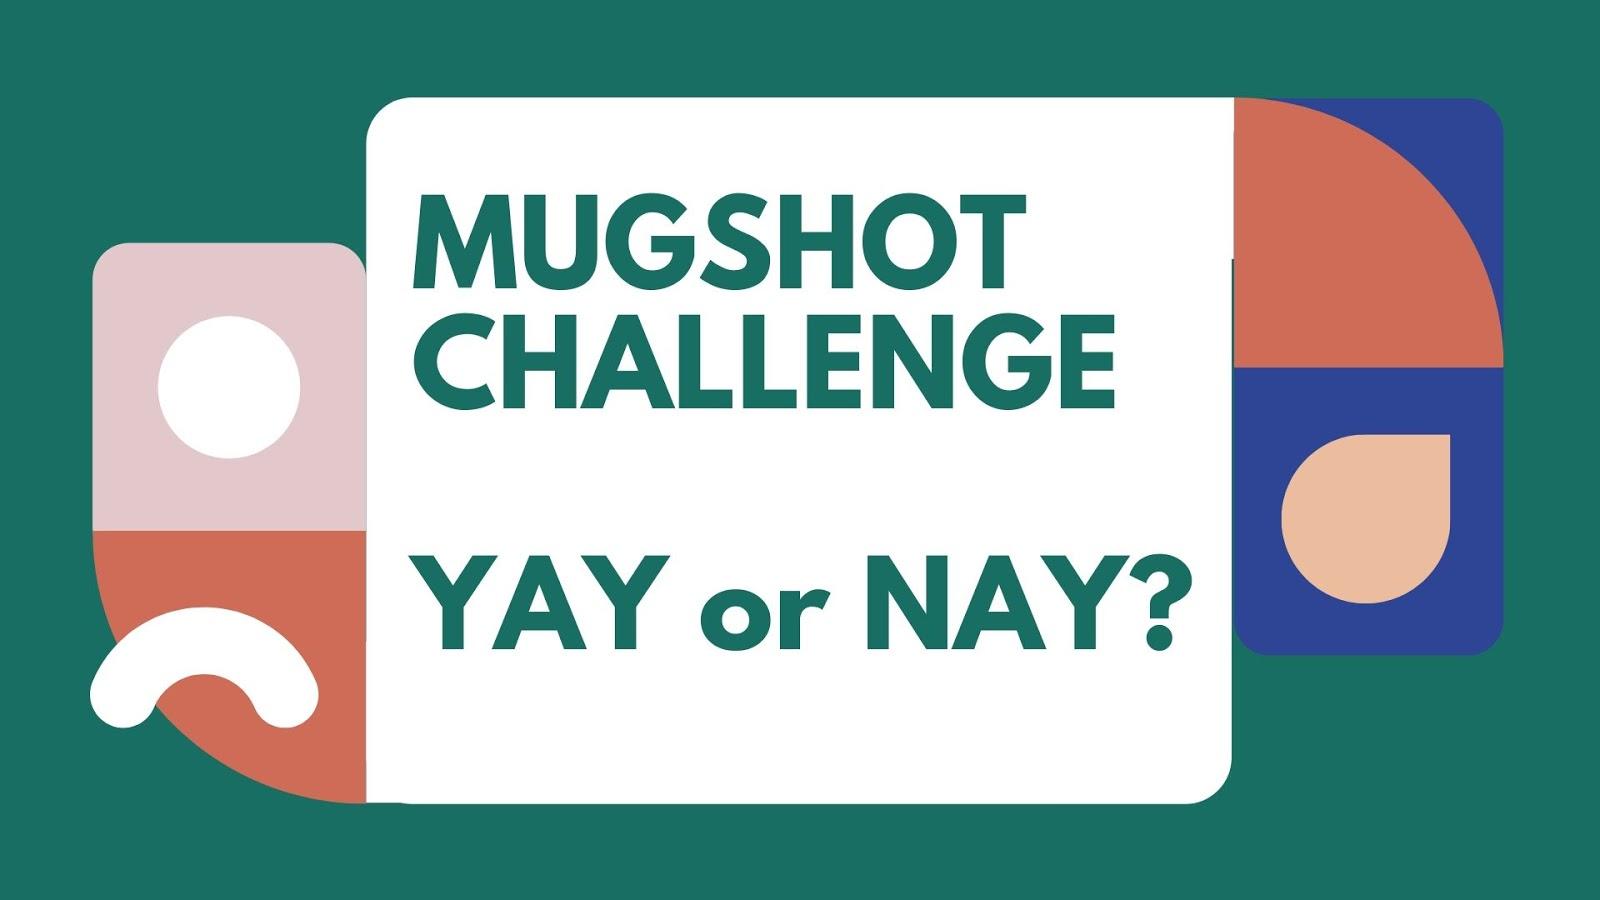 tentang mugshot challenge